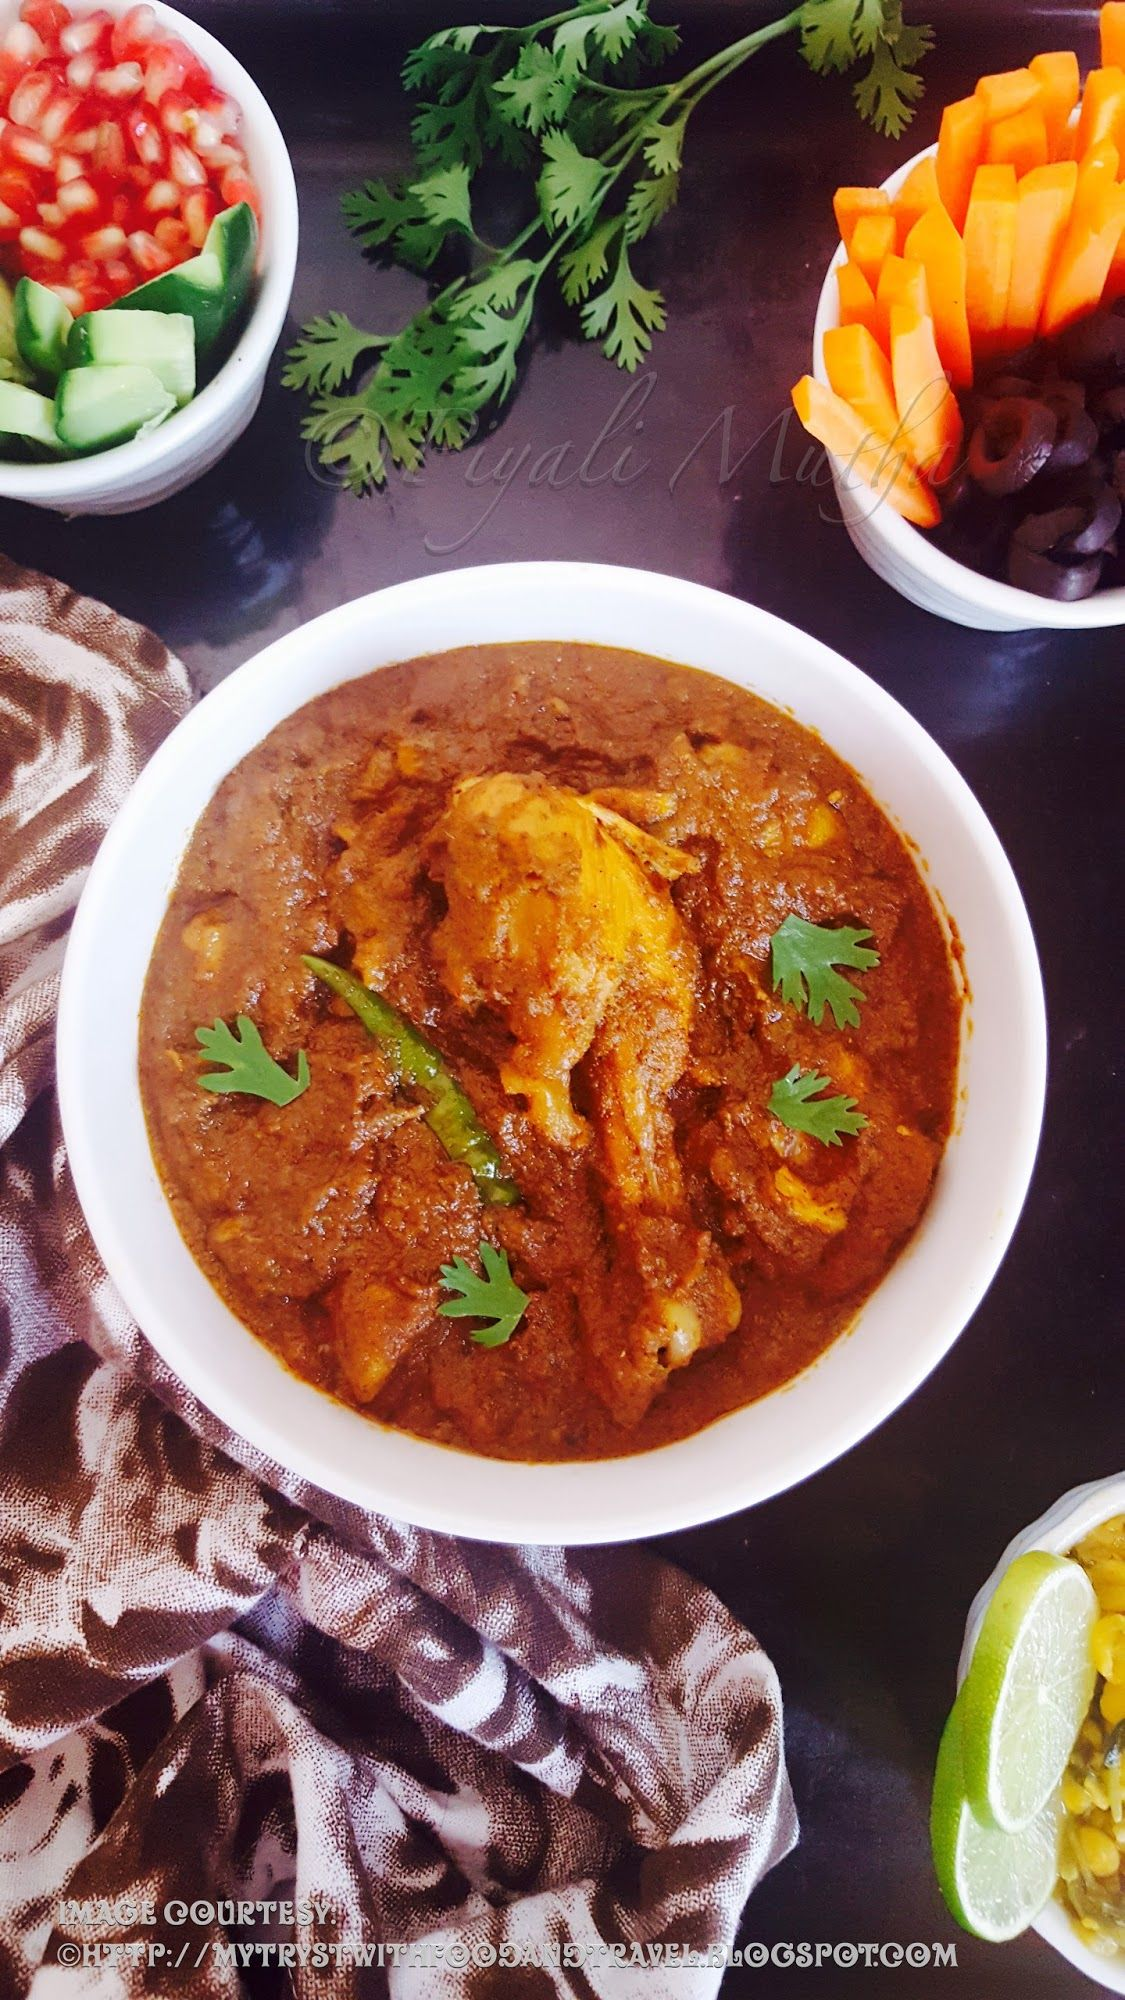 Chicken Xacuti Recipe Goan Chicken Curry Recipe Goan Cuisine Goan Foods Recipes Goan Non Vegetarian Recipe Curry Chicken Recipes Goan Recipes Curry Recipes